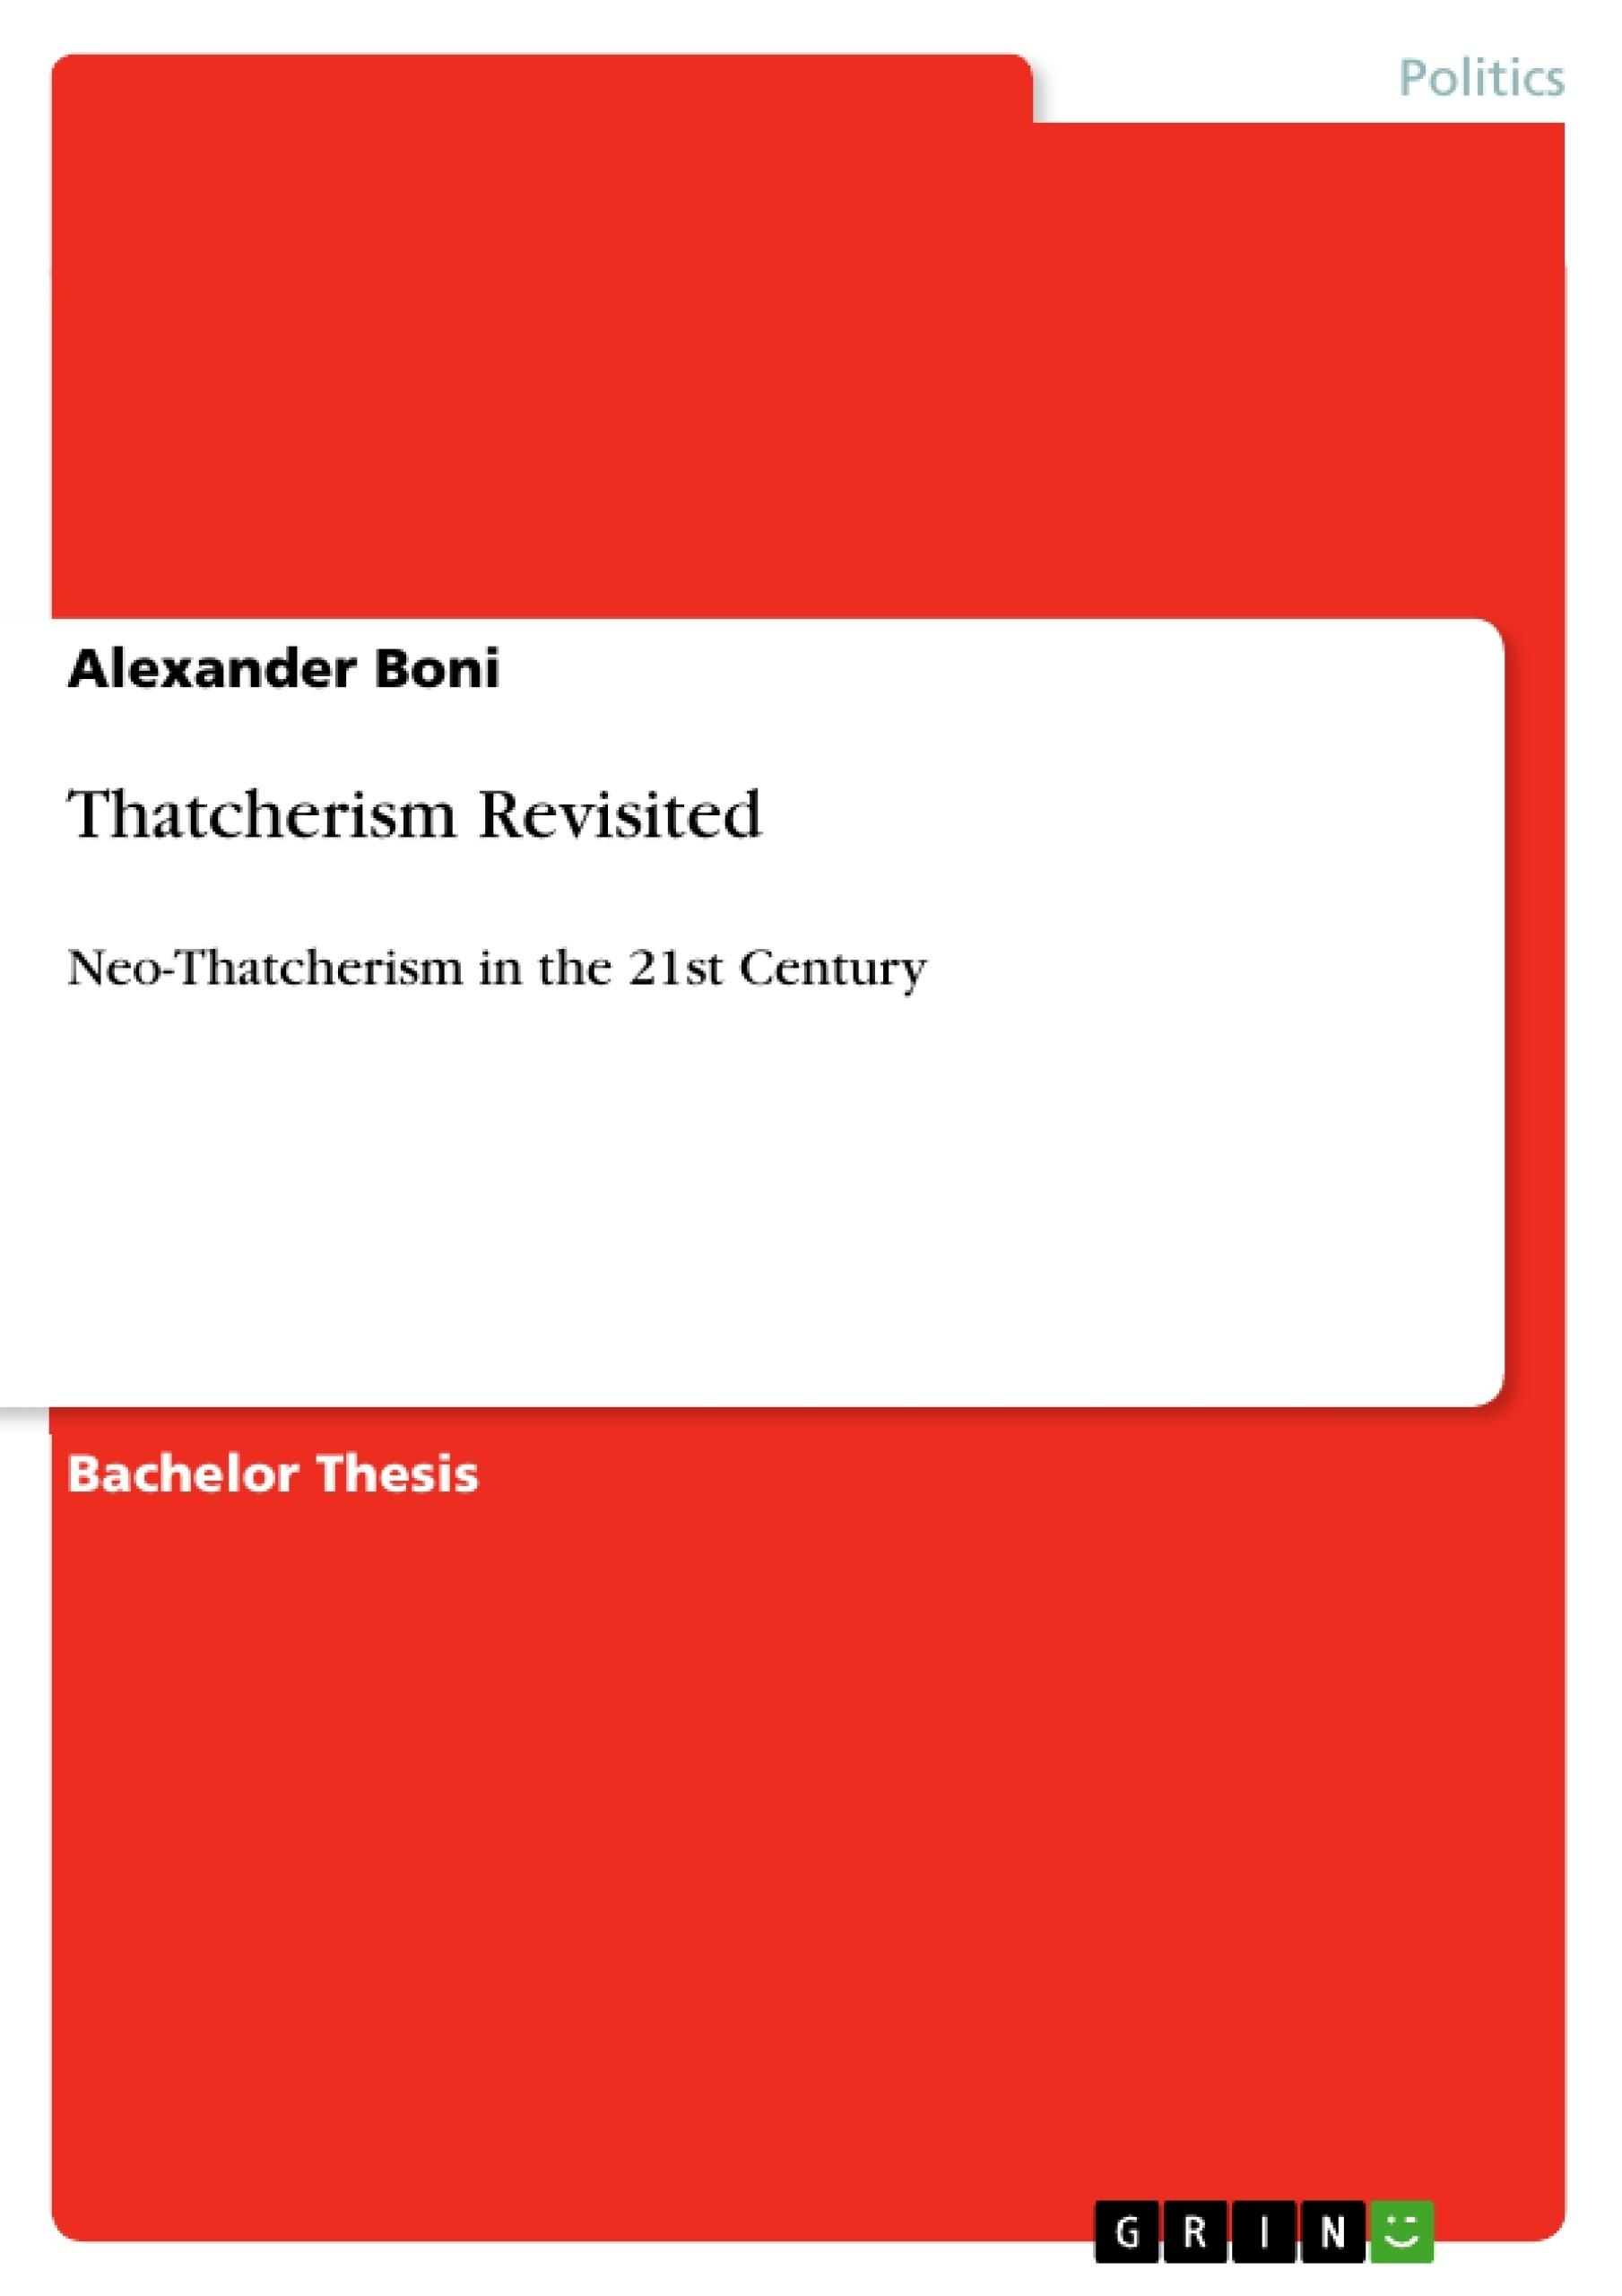 Title: Thatcherism Revisited